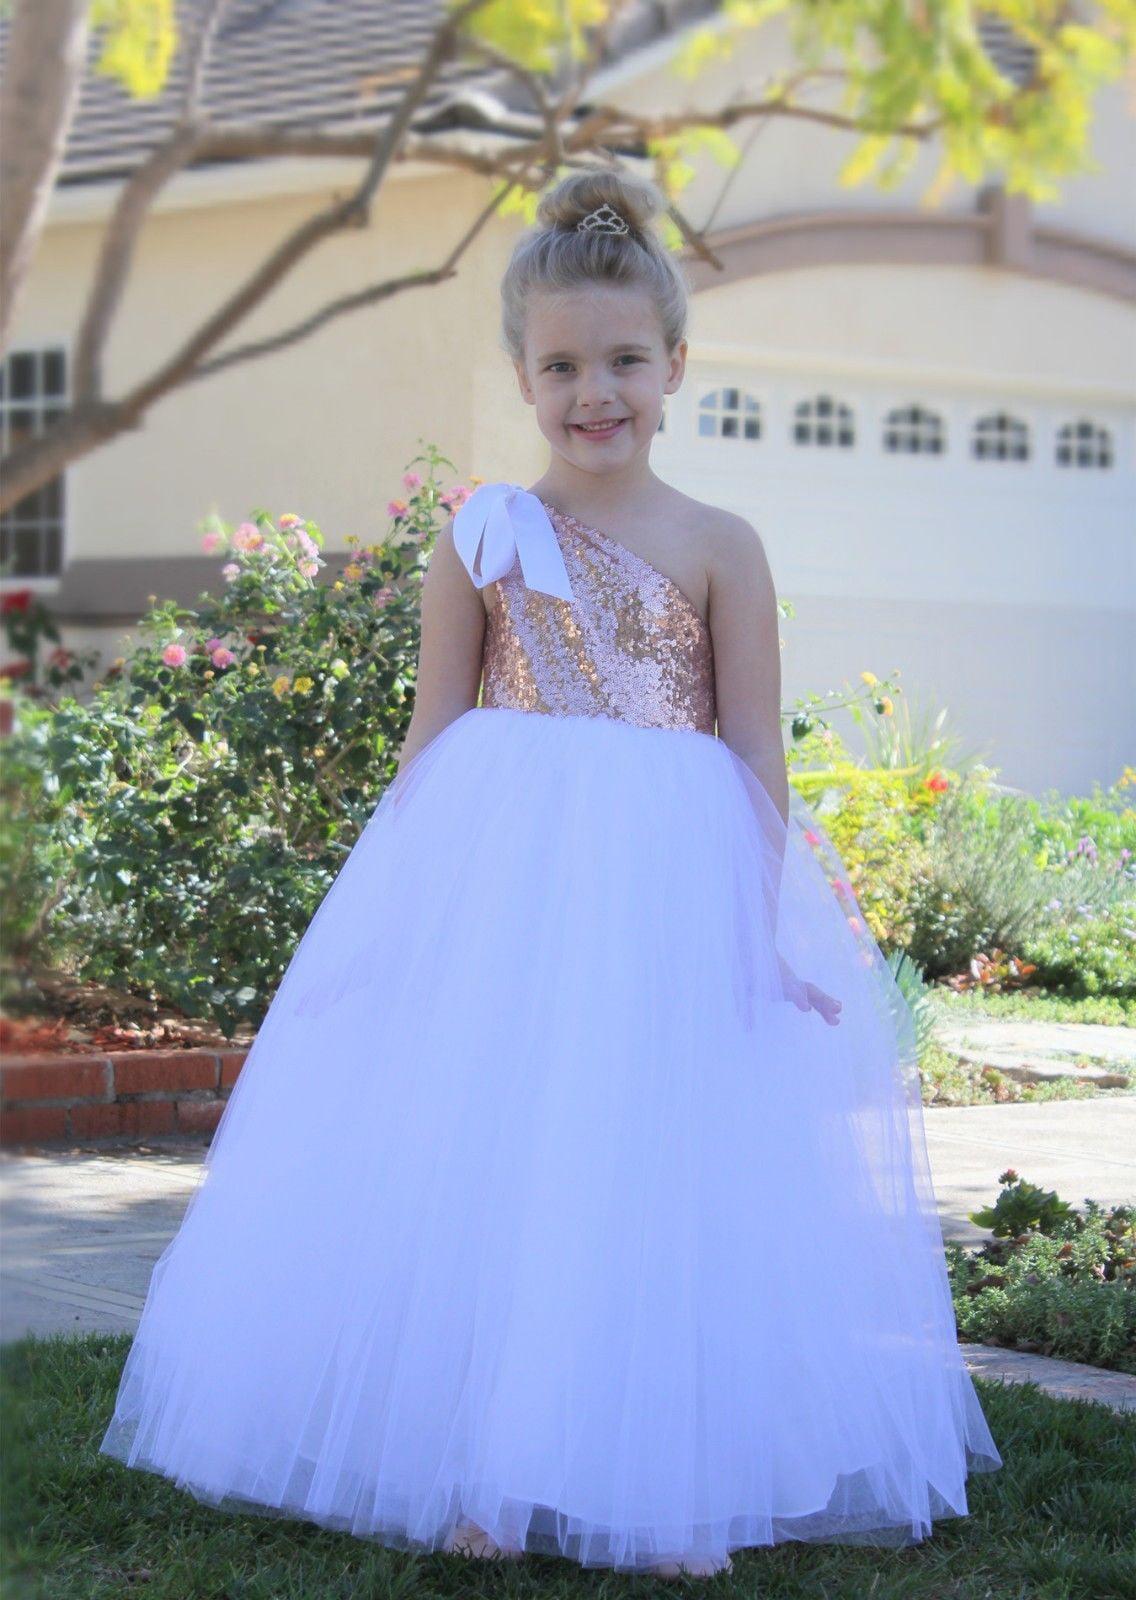 One-Shoulder Sequin Tutu Flower Girl Dress Wedding Pageant Dresses Ball Gown Tutu Dresses Pageant Dress 182